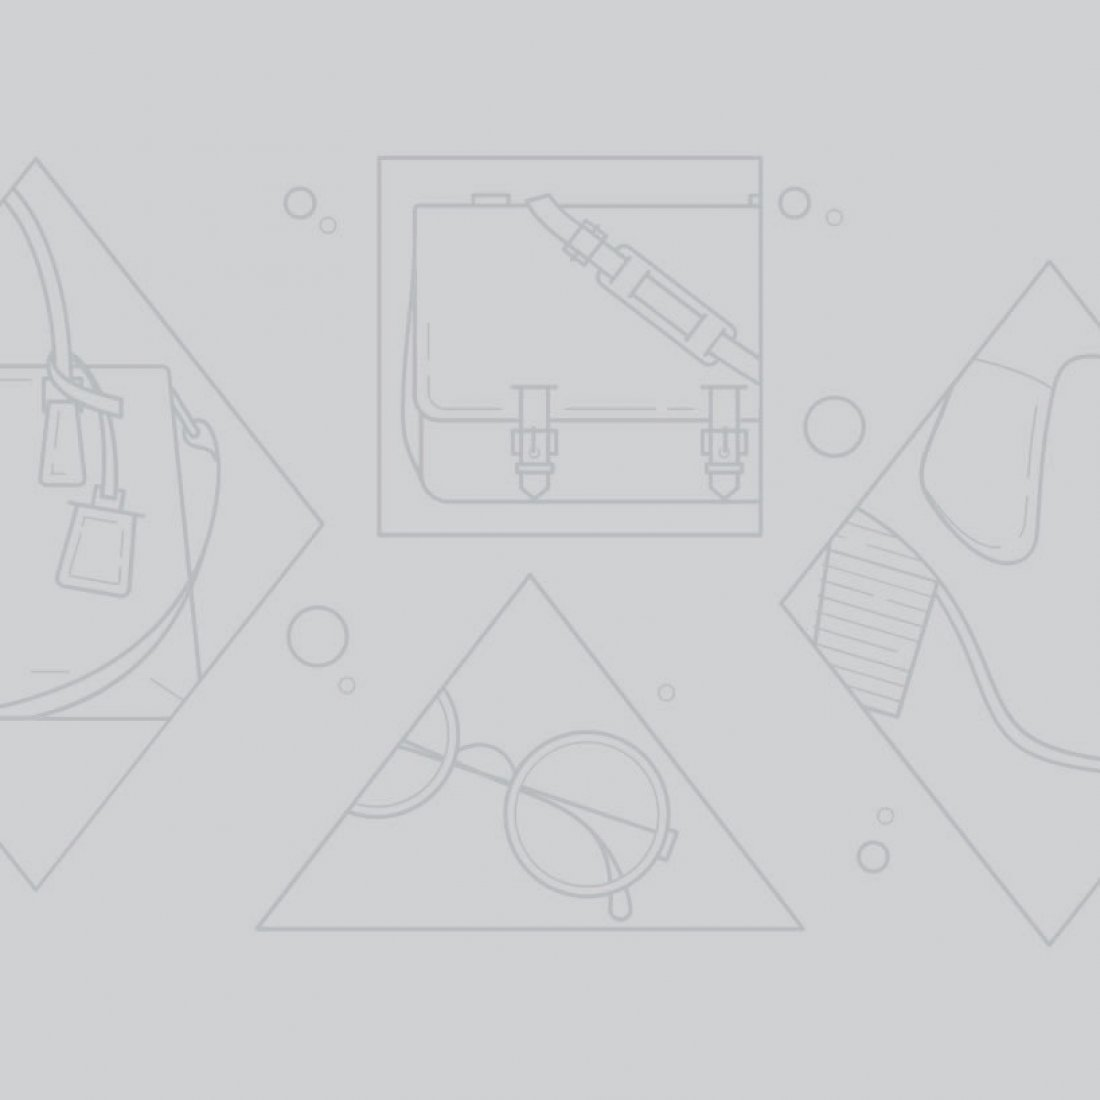 Гирлянда Sofi 3-D Lampa Лампочка спираль оптом фото 1